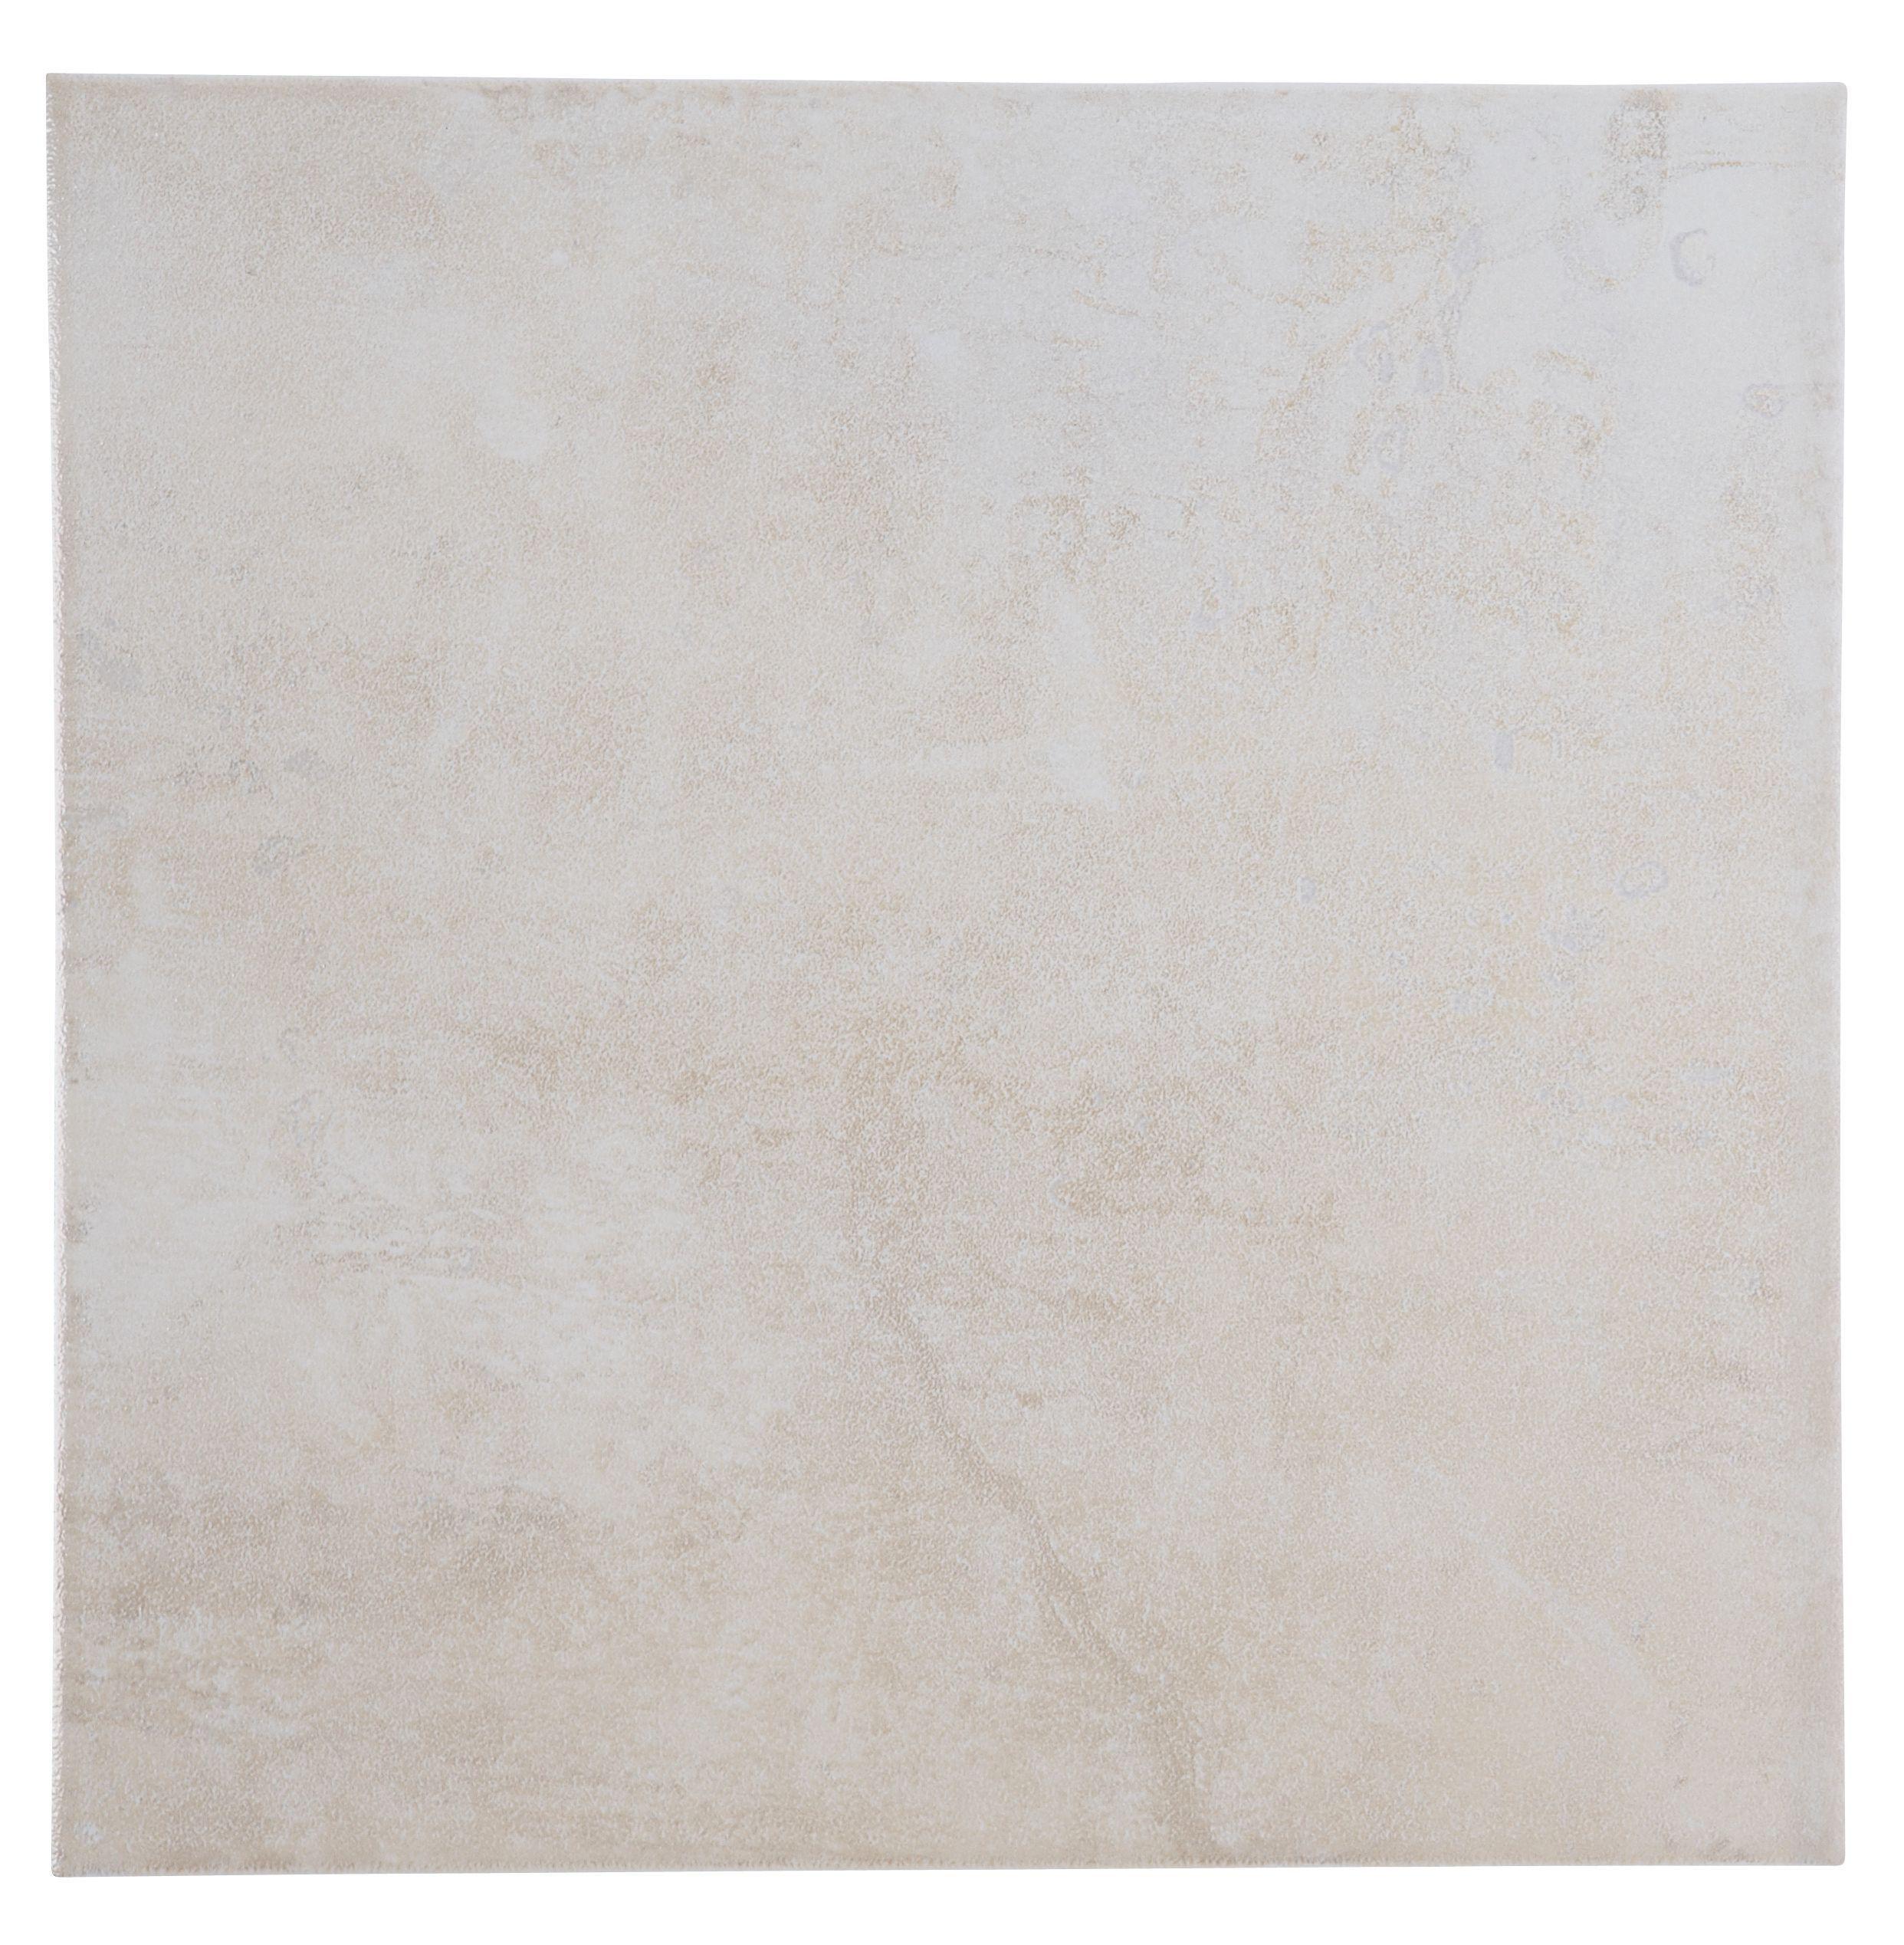 Natural Travertine Mosaic Tile L 300mm W 300mm: Metallic Cream Porcelain Wall & Floor Tile, Pack Of 16, (L